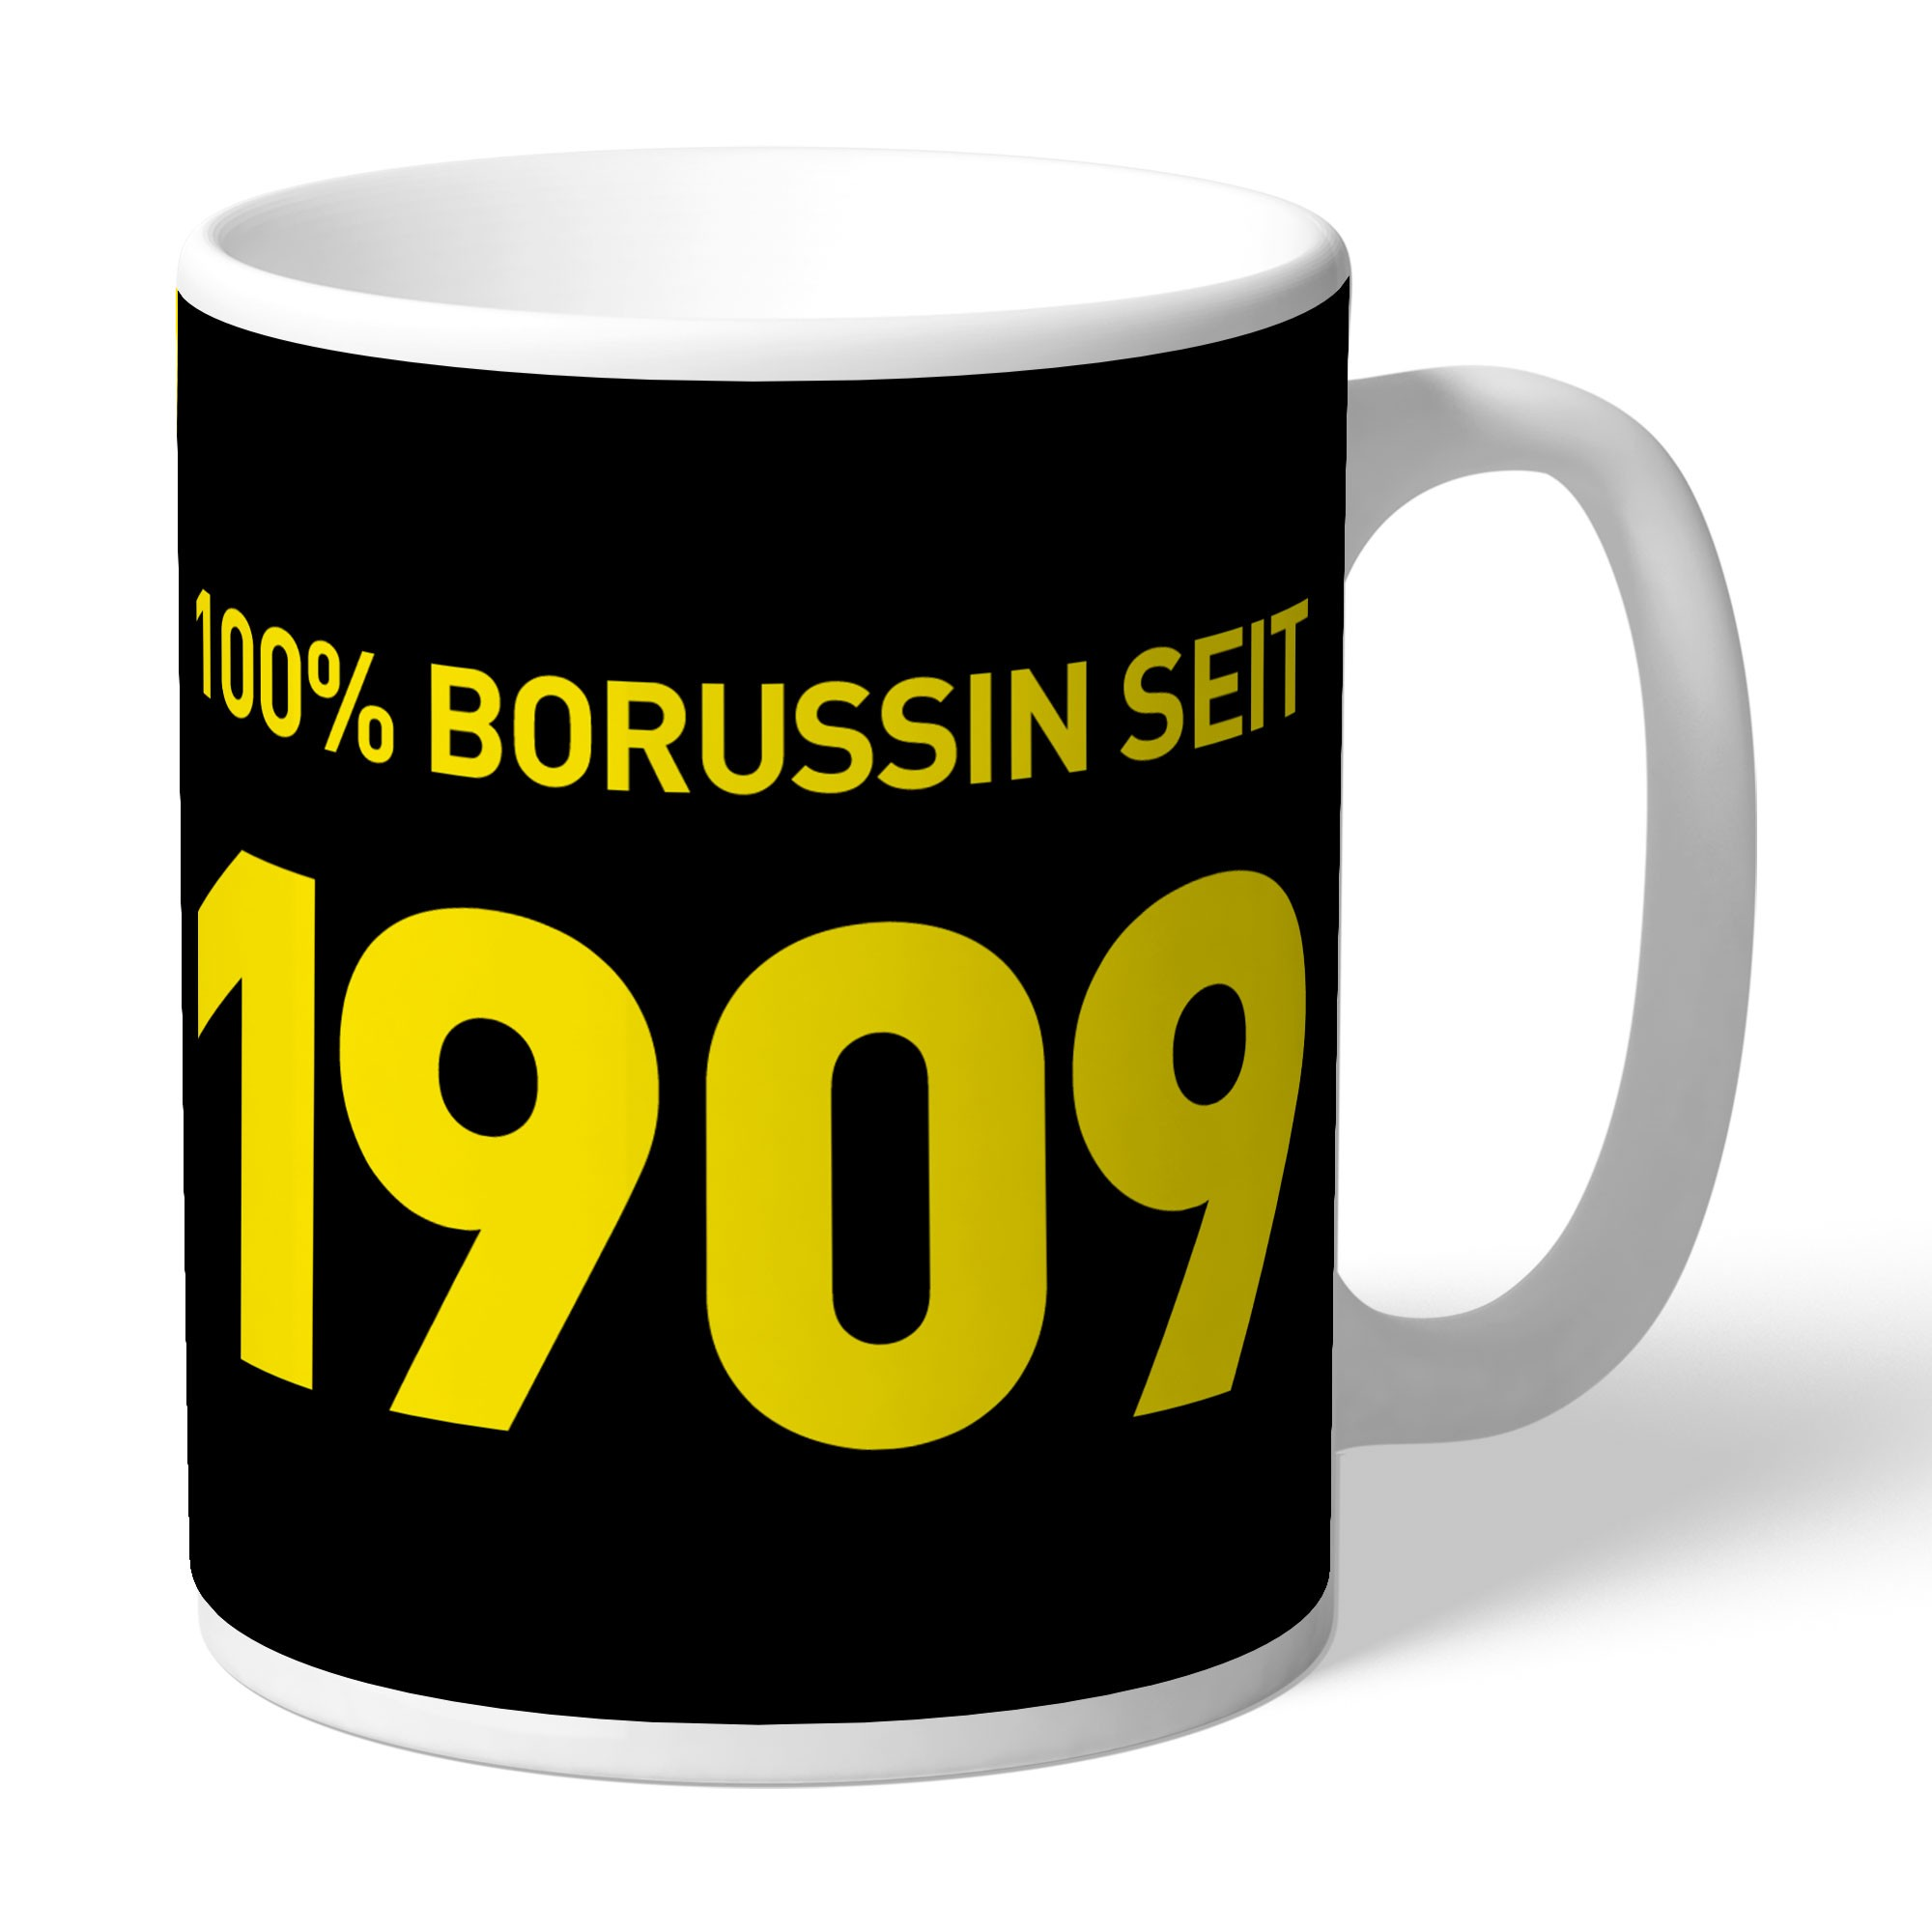 53. BVB-Tasse indiv. 100% Borussin (Geburtsjahr)